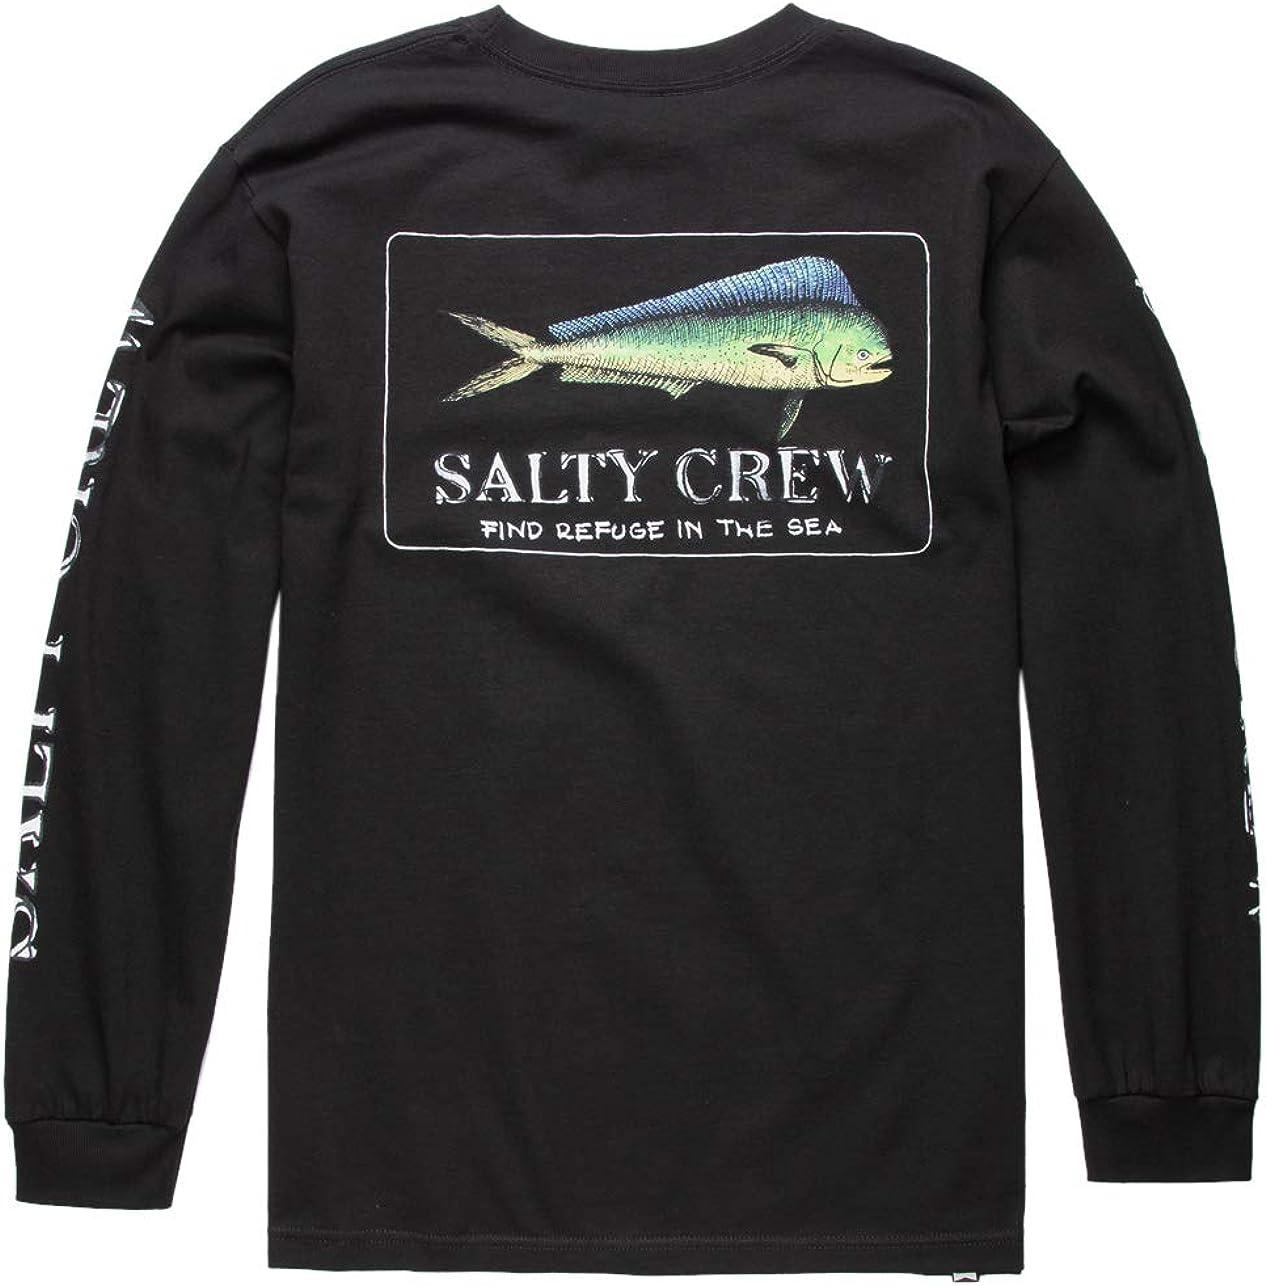 Salty Crew Men's El Dorado Long Sleeve Tee